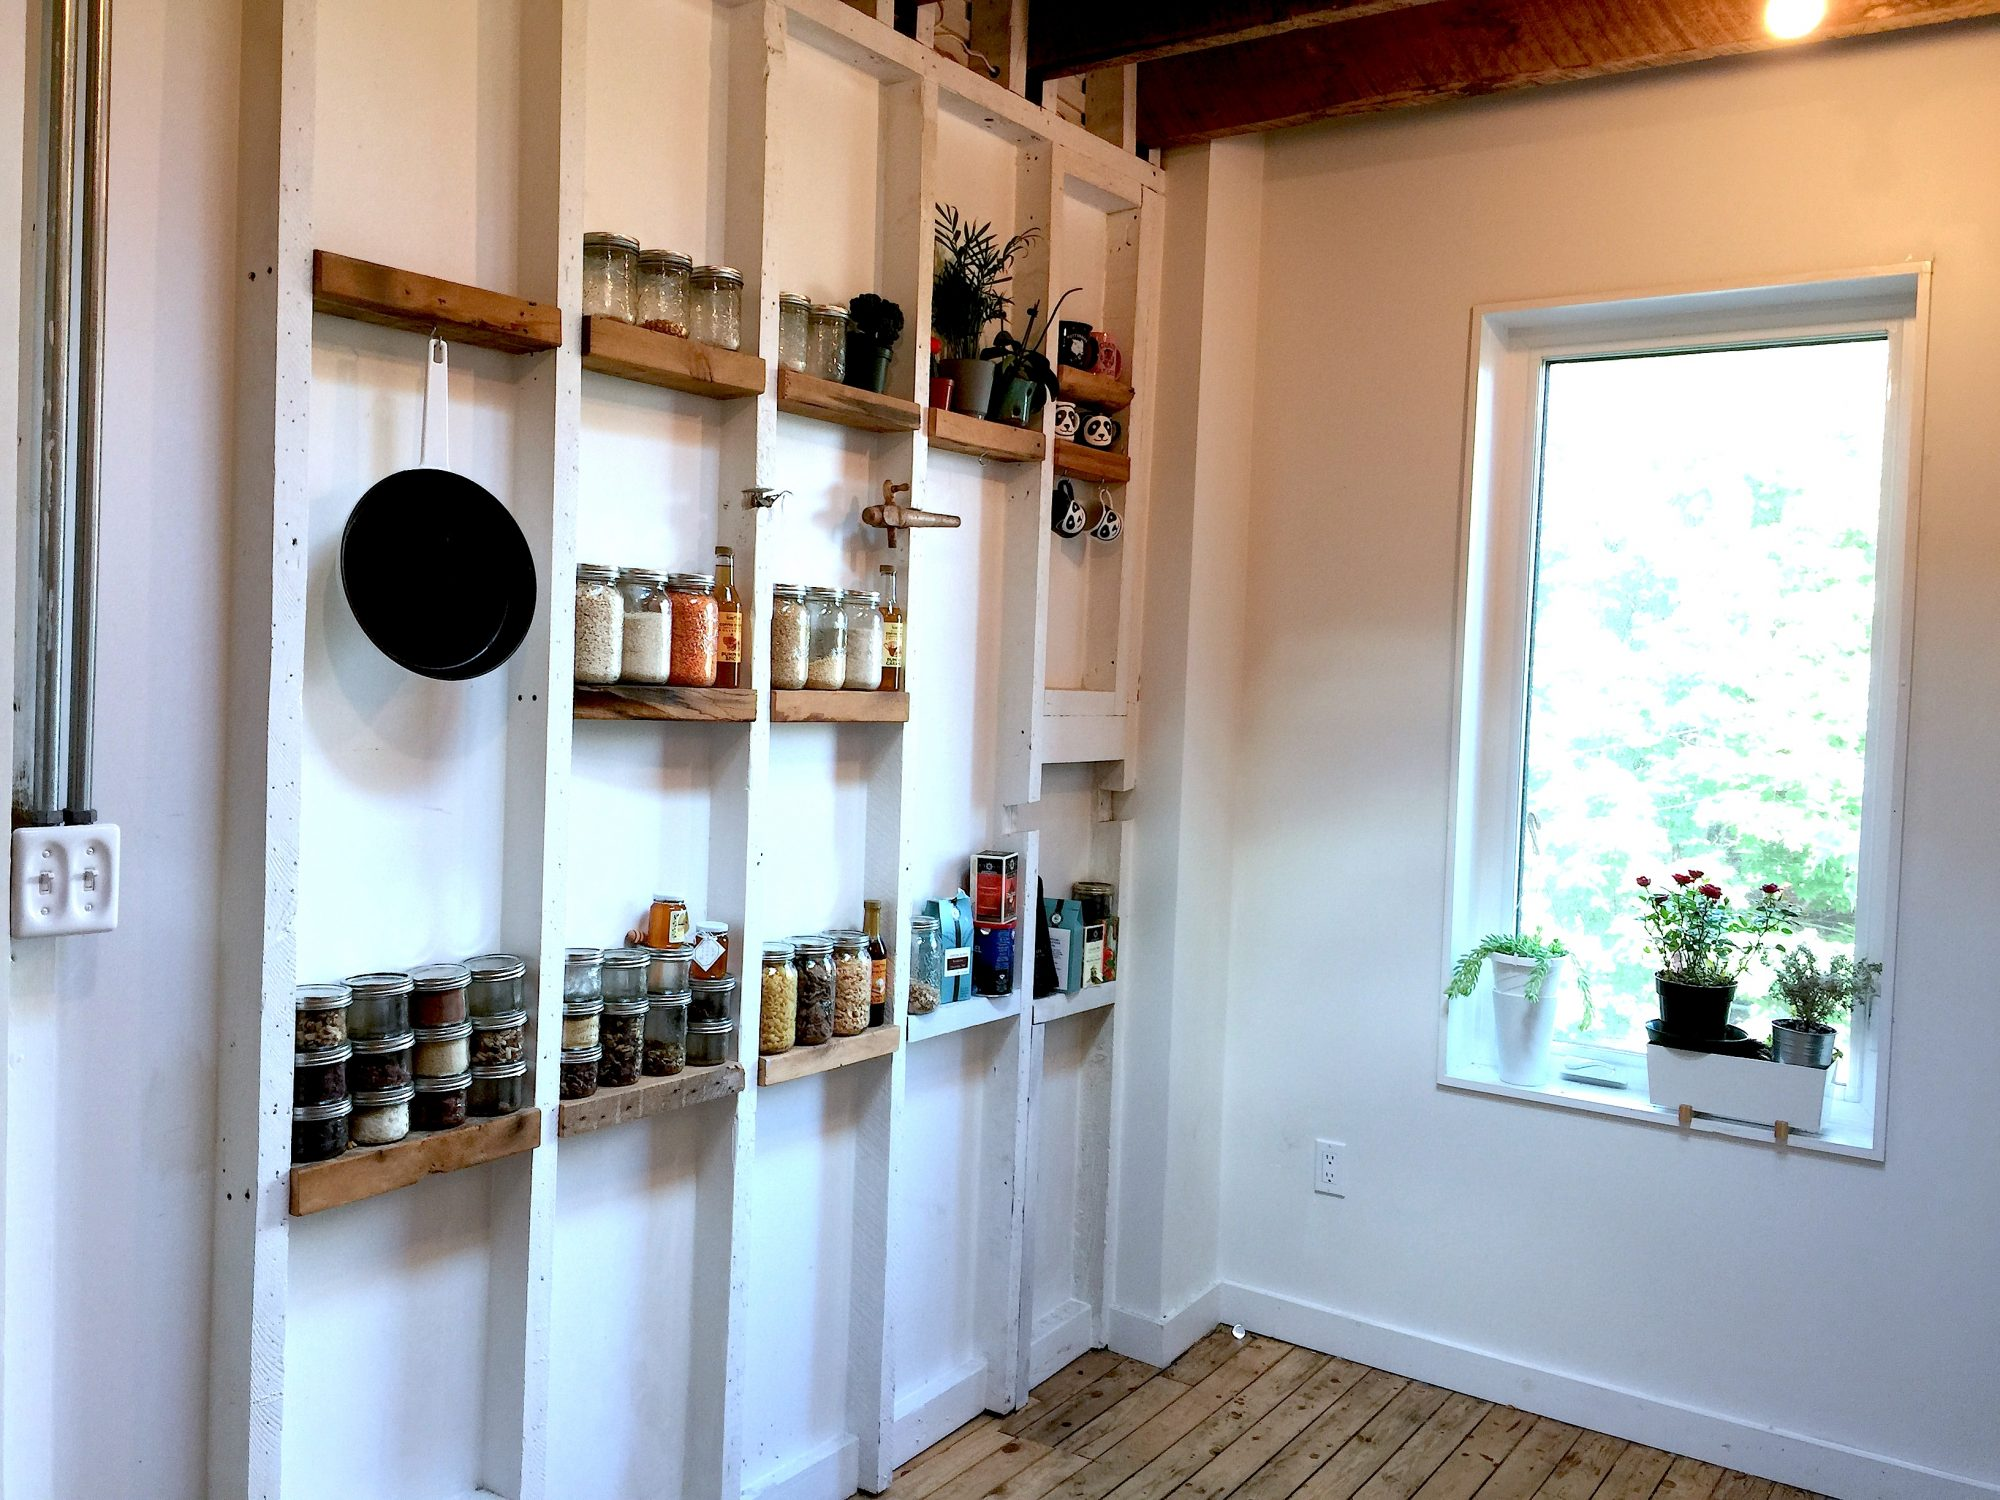 tornoto-apartment-for-rent-917-ossington-avenue-5